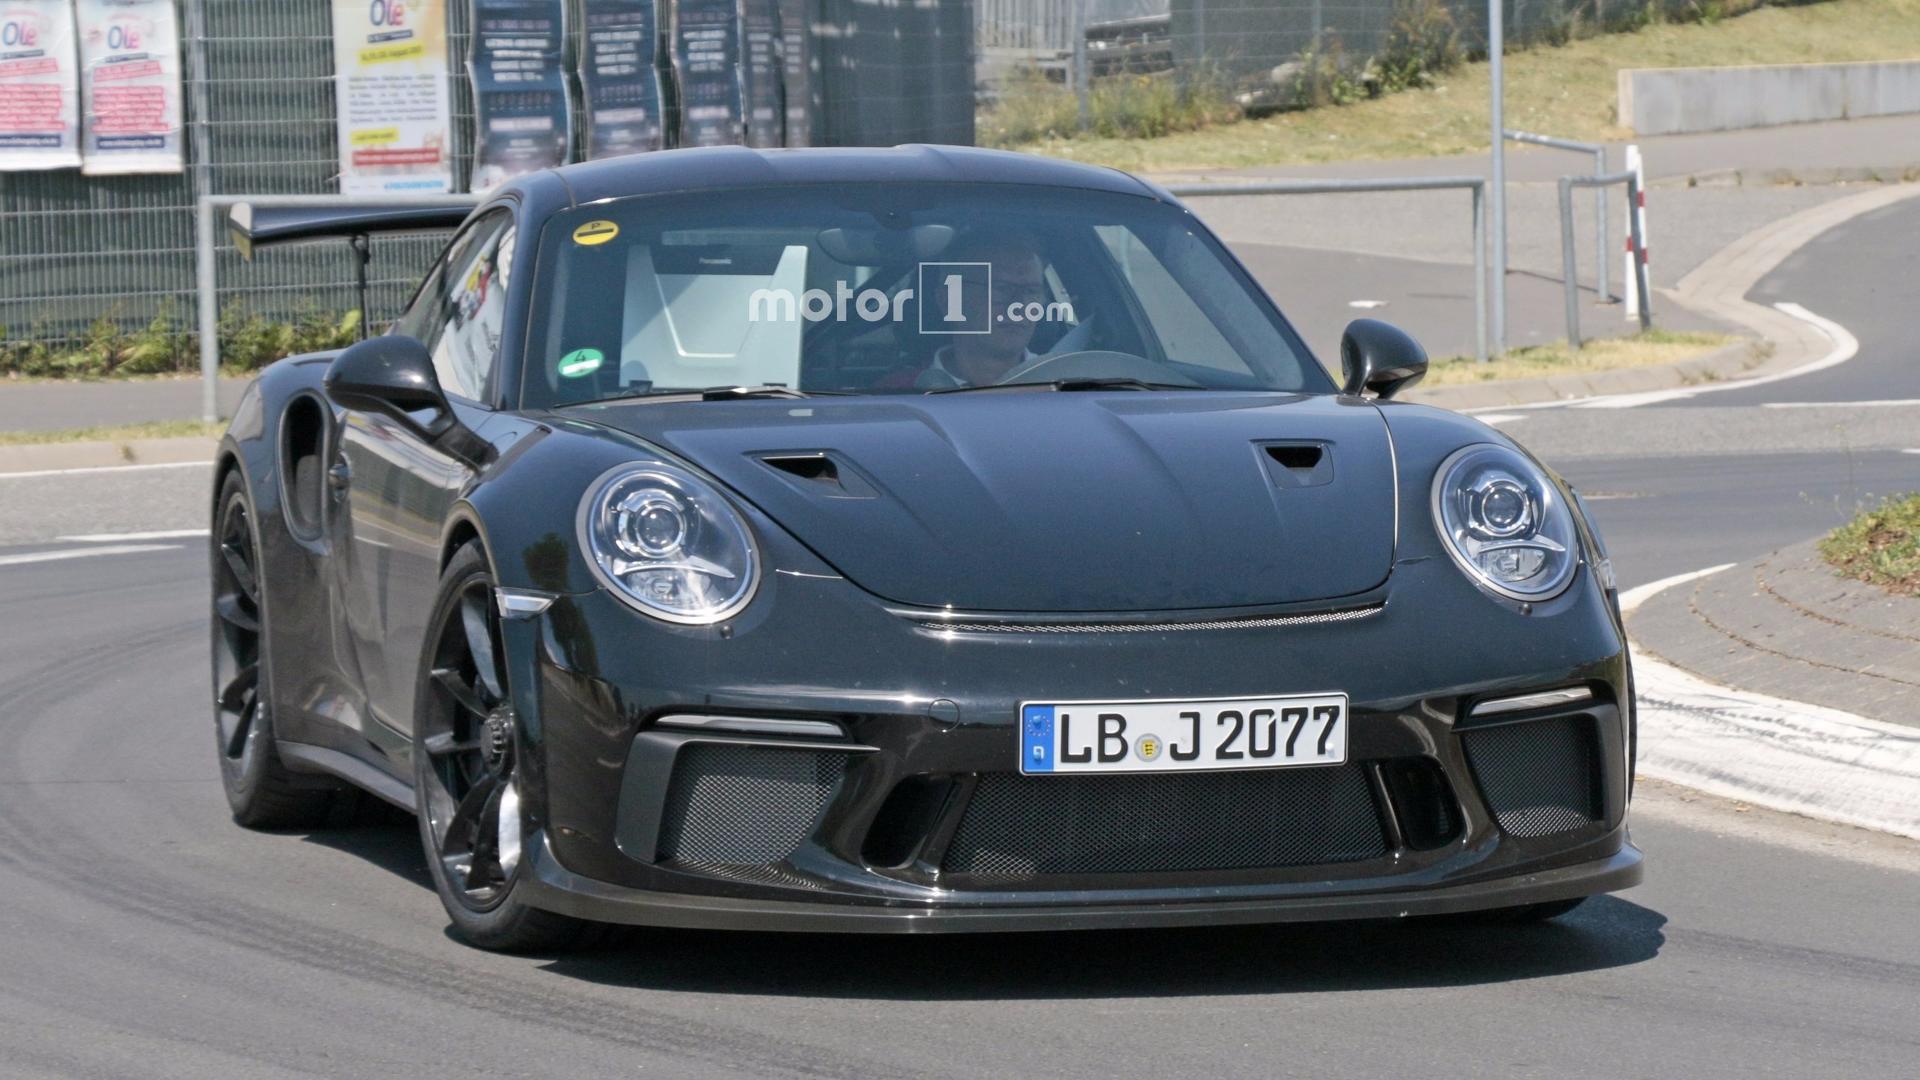 porsche 911 gt3 rs 2018 interior. porsche 911 gt3 rs 2018 interior